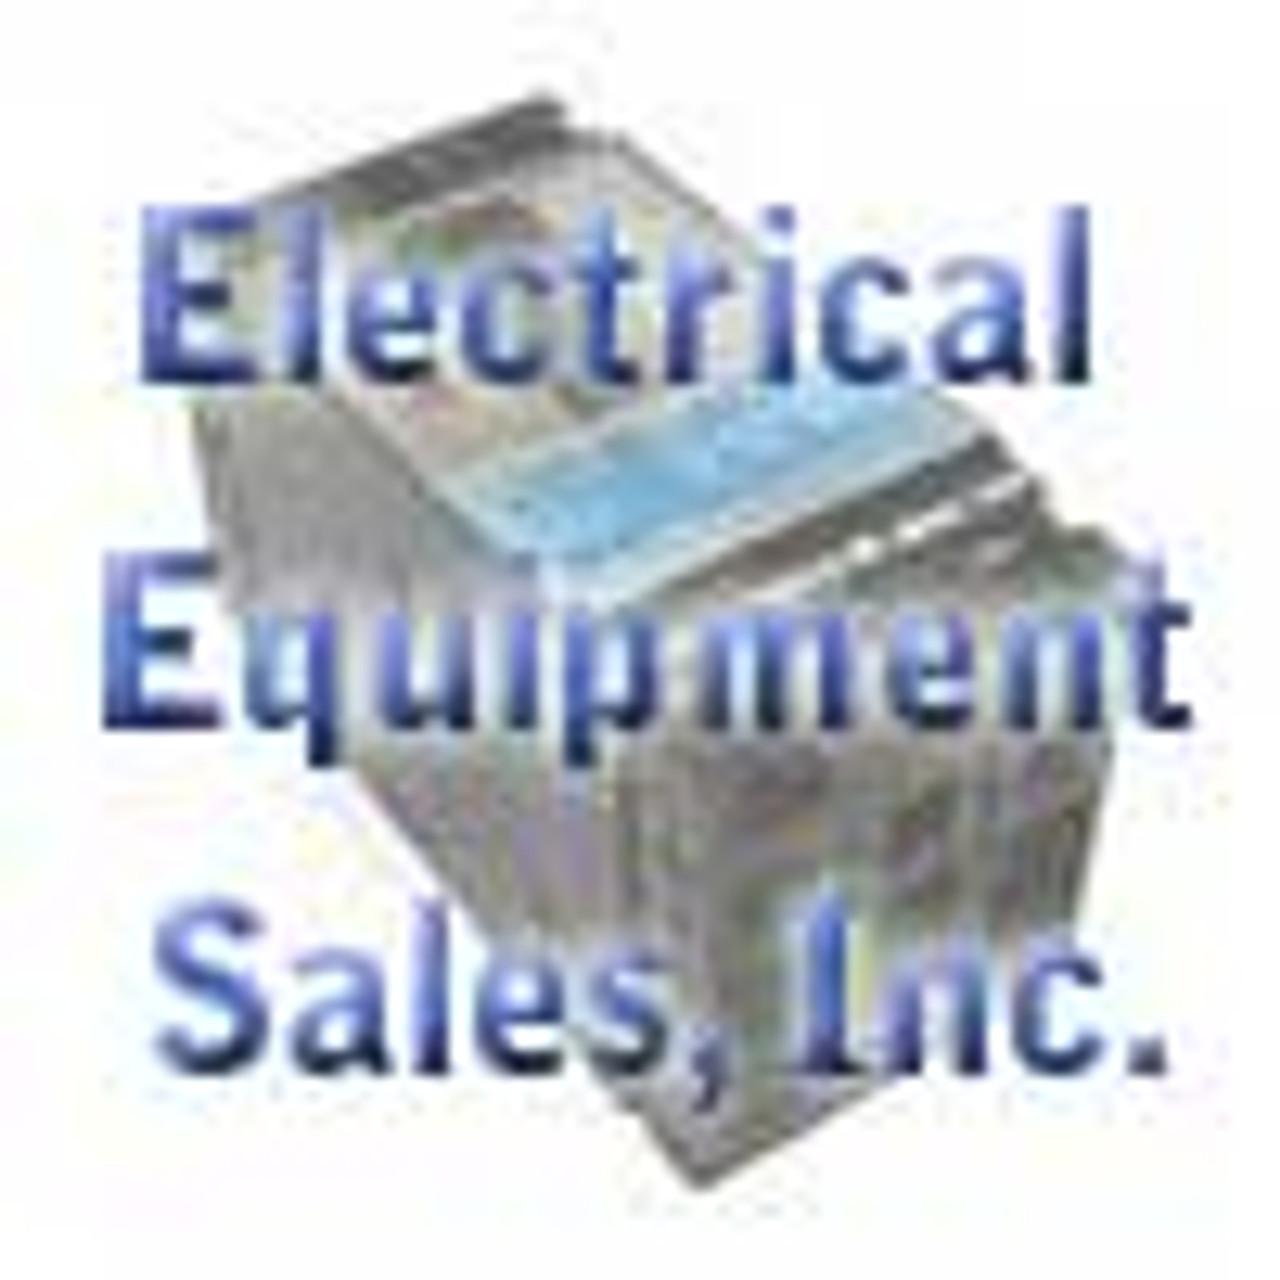 Square D LJA36400U31X 3 Pole 400 Amp 600V 65K LI Circuit Breaker - New Pullout